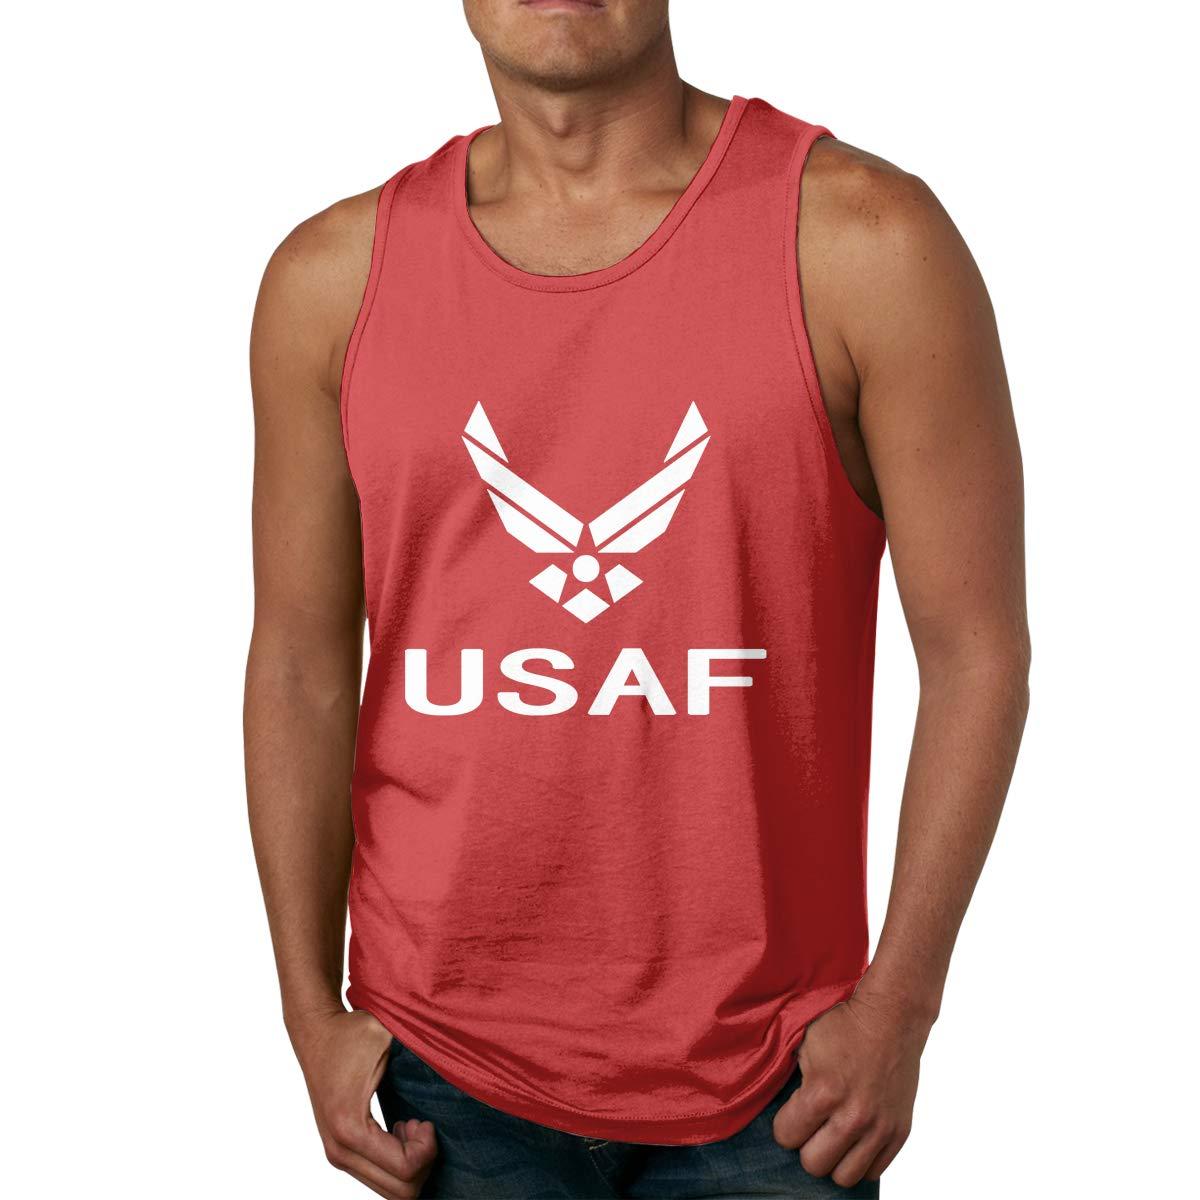 USAF Air Force Mens Printed Vest Sports Tank-Top Tee Leisure Sleeveless Shirt